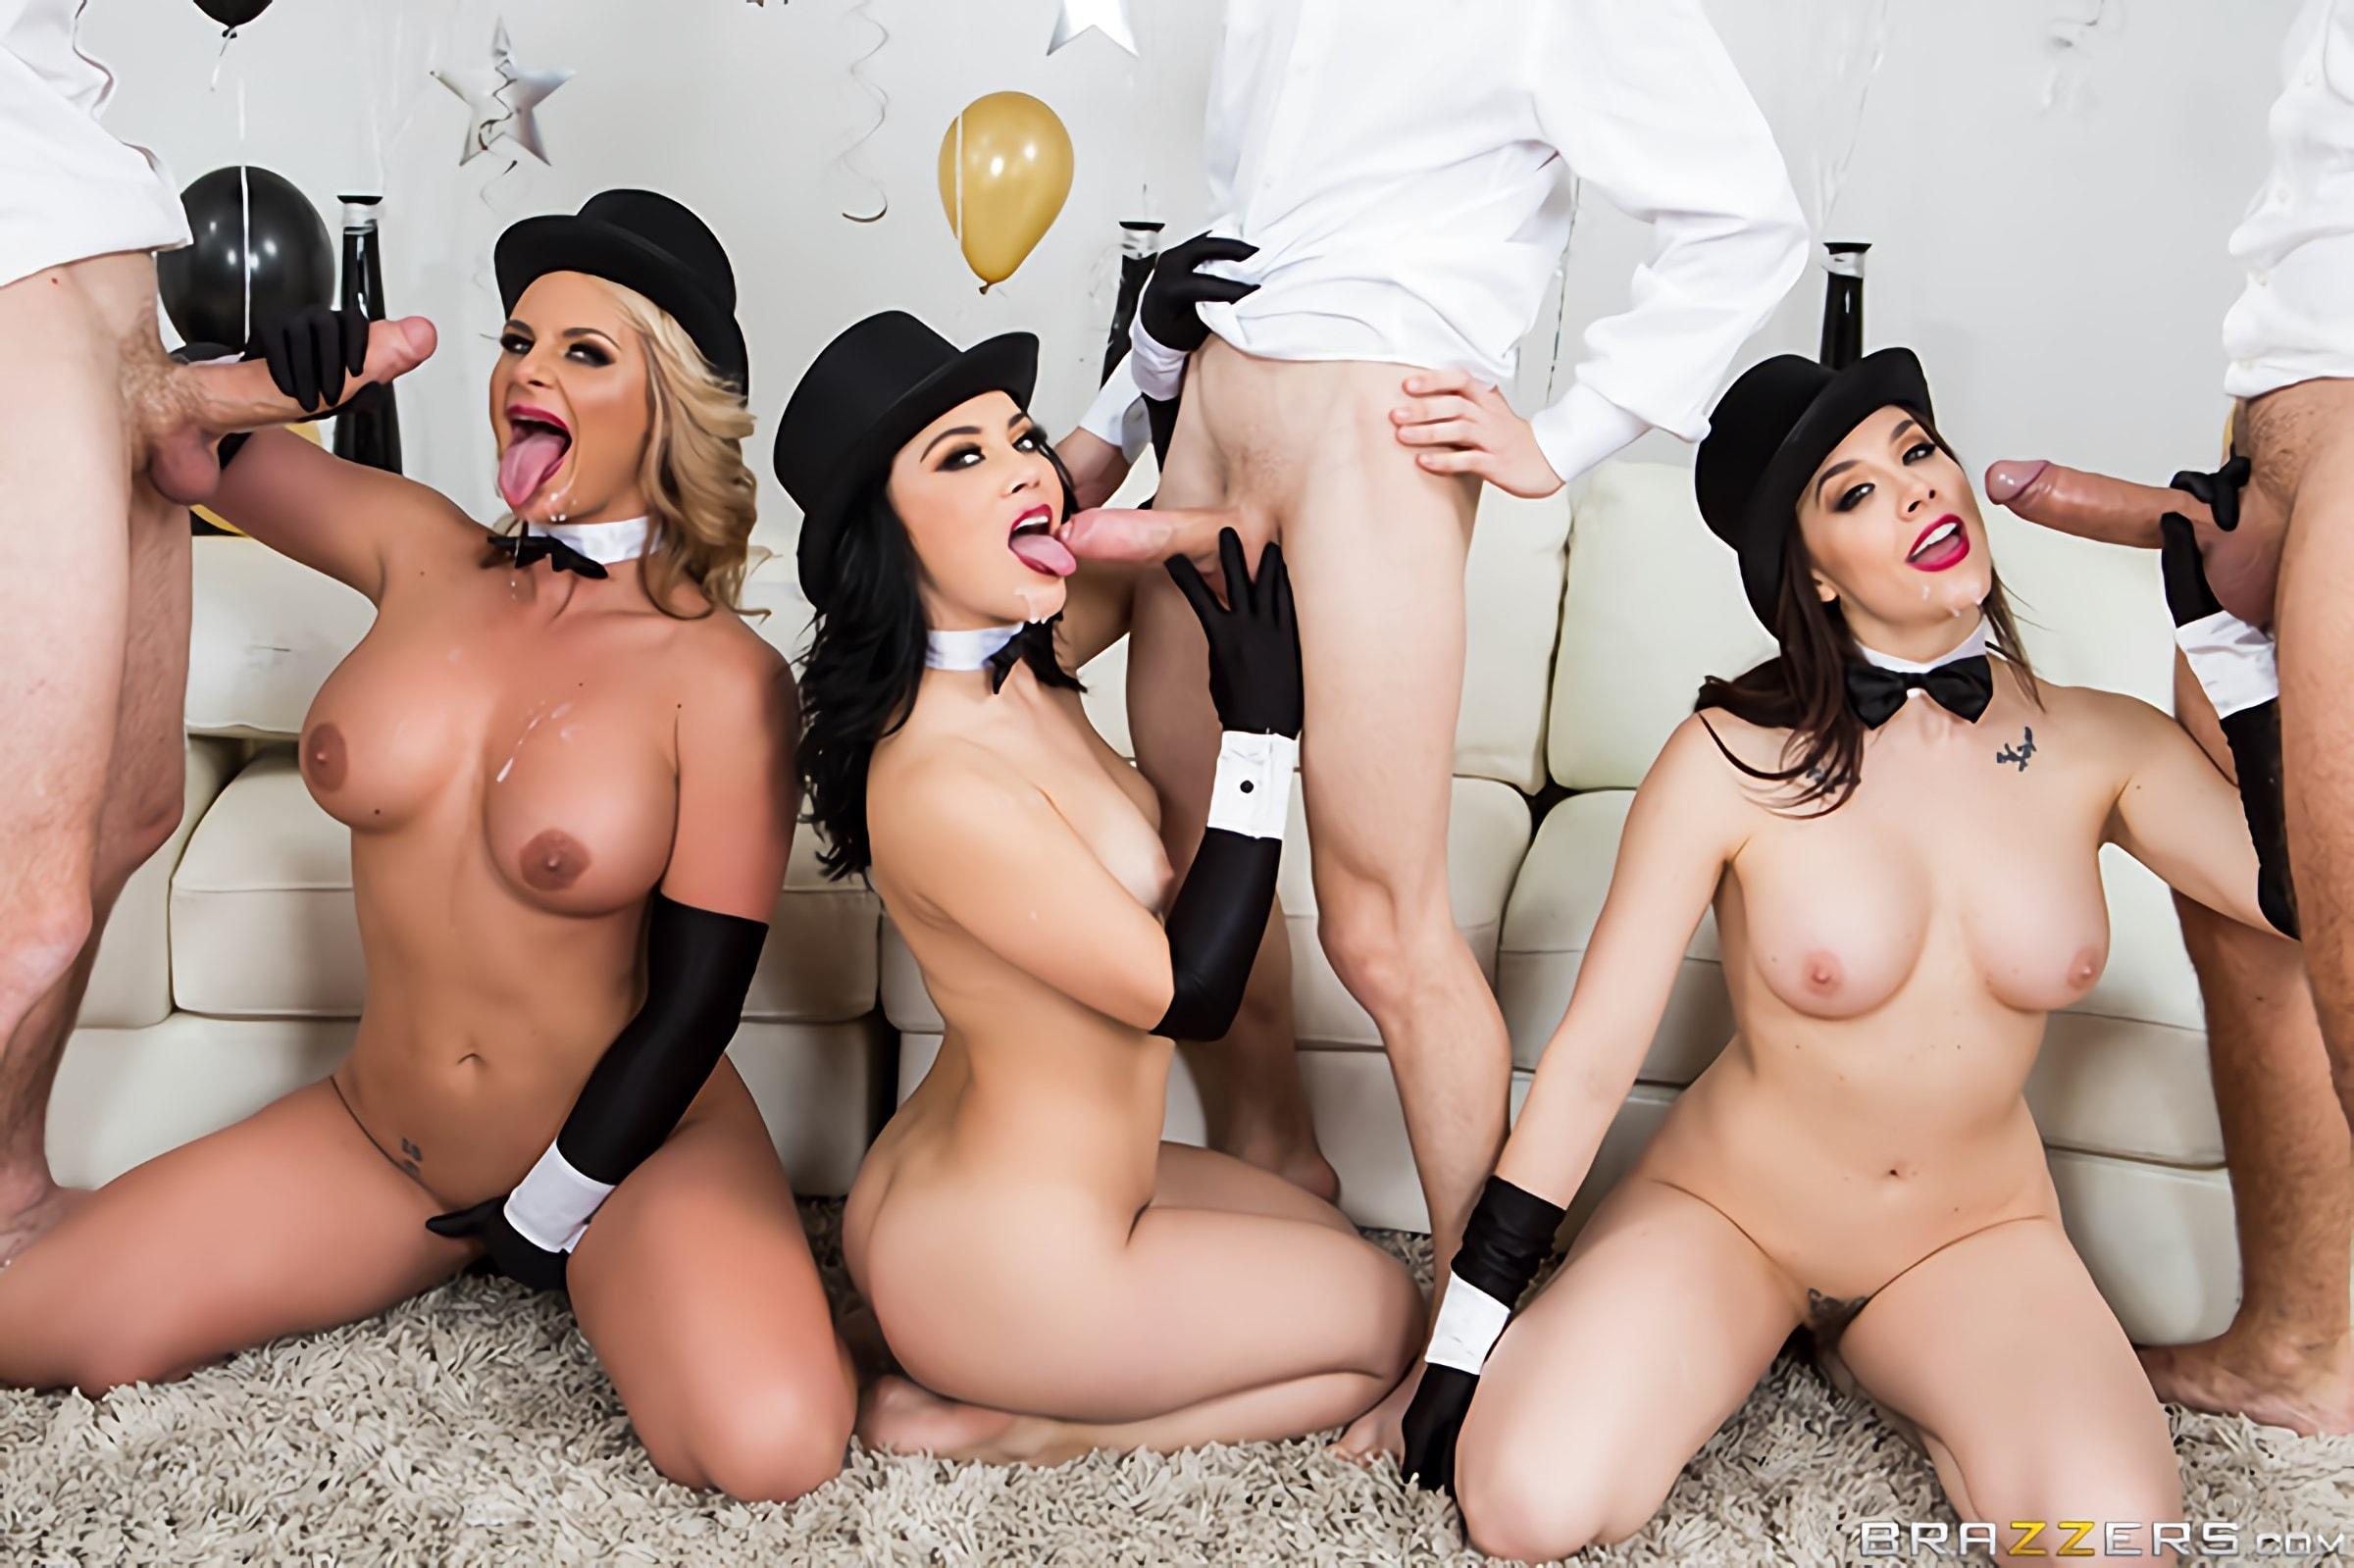 Порно вечеринки онлайн brazzers это